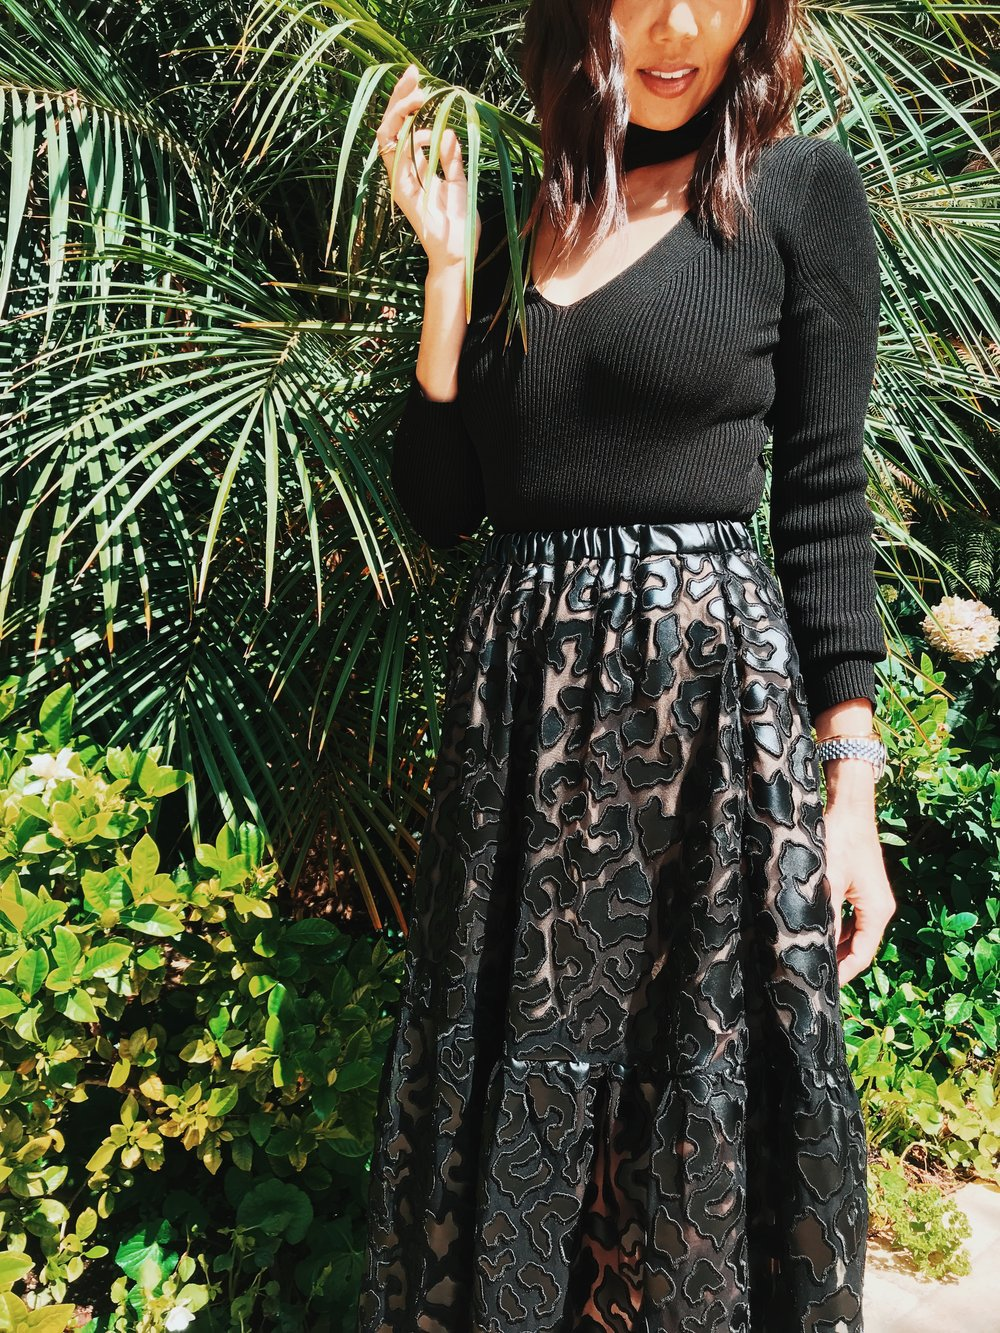 Skirt: Stella Mccartney | Bodysuit: Cushnie et ochs | Hair: Nicolas Flores | Make-up: Blushington | Photo: Drew Evans